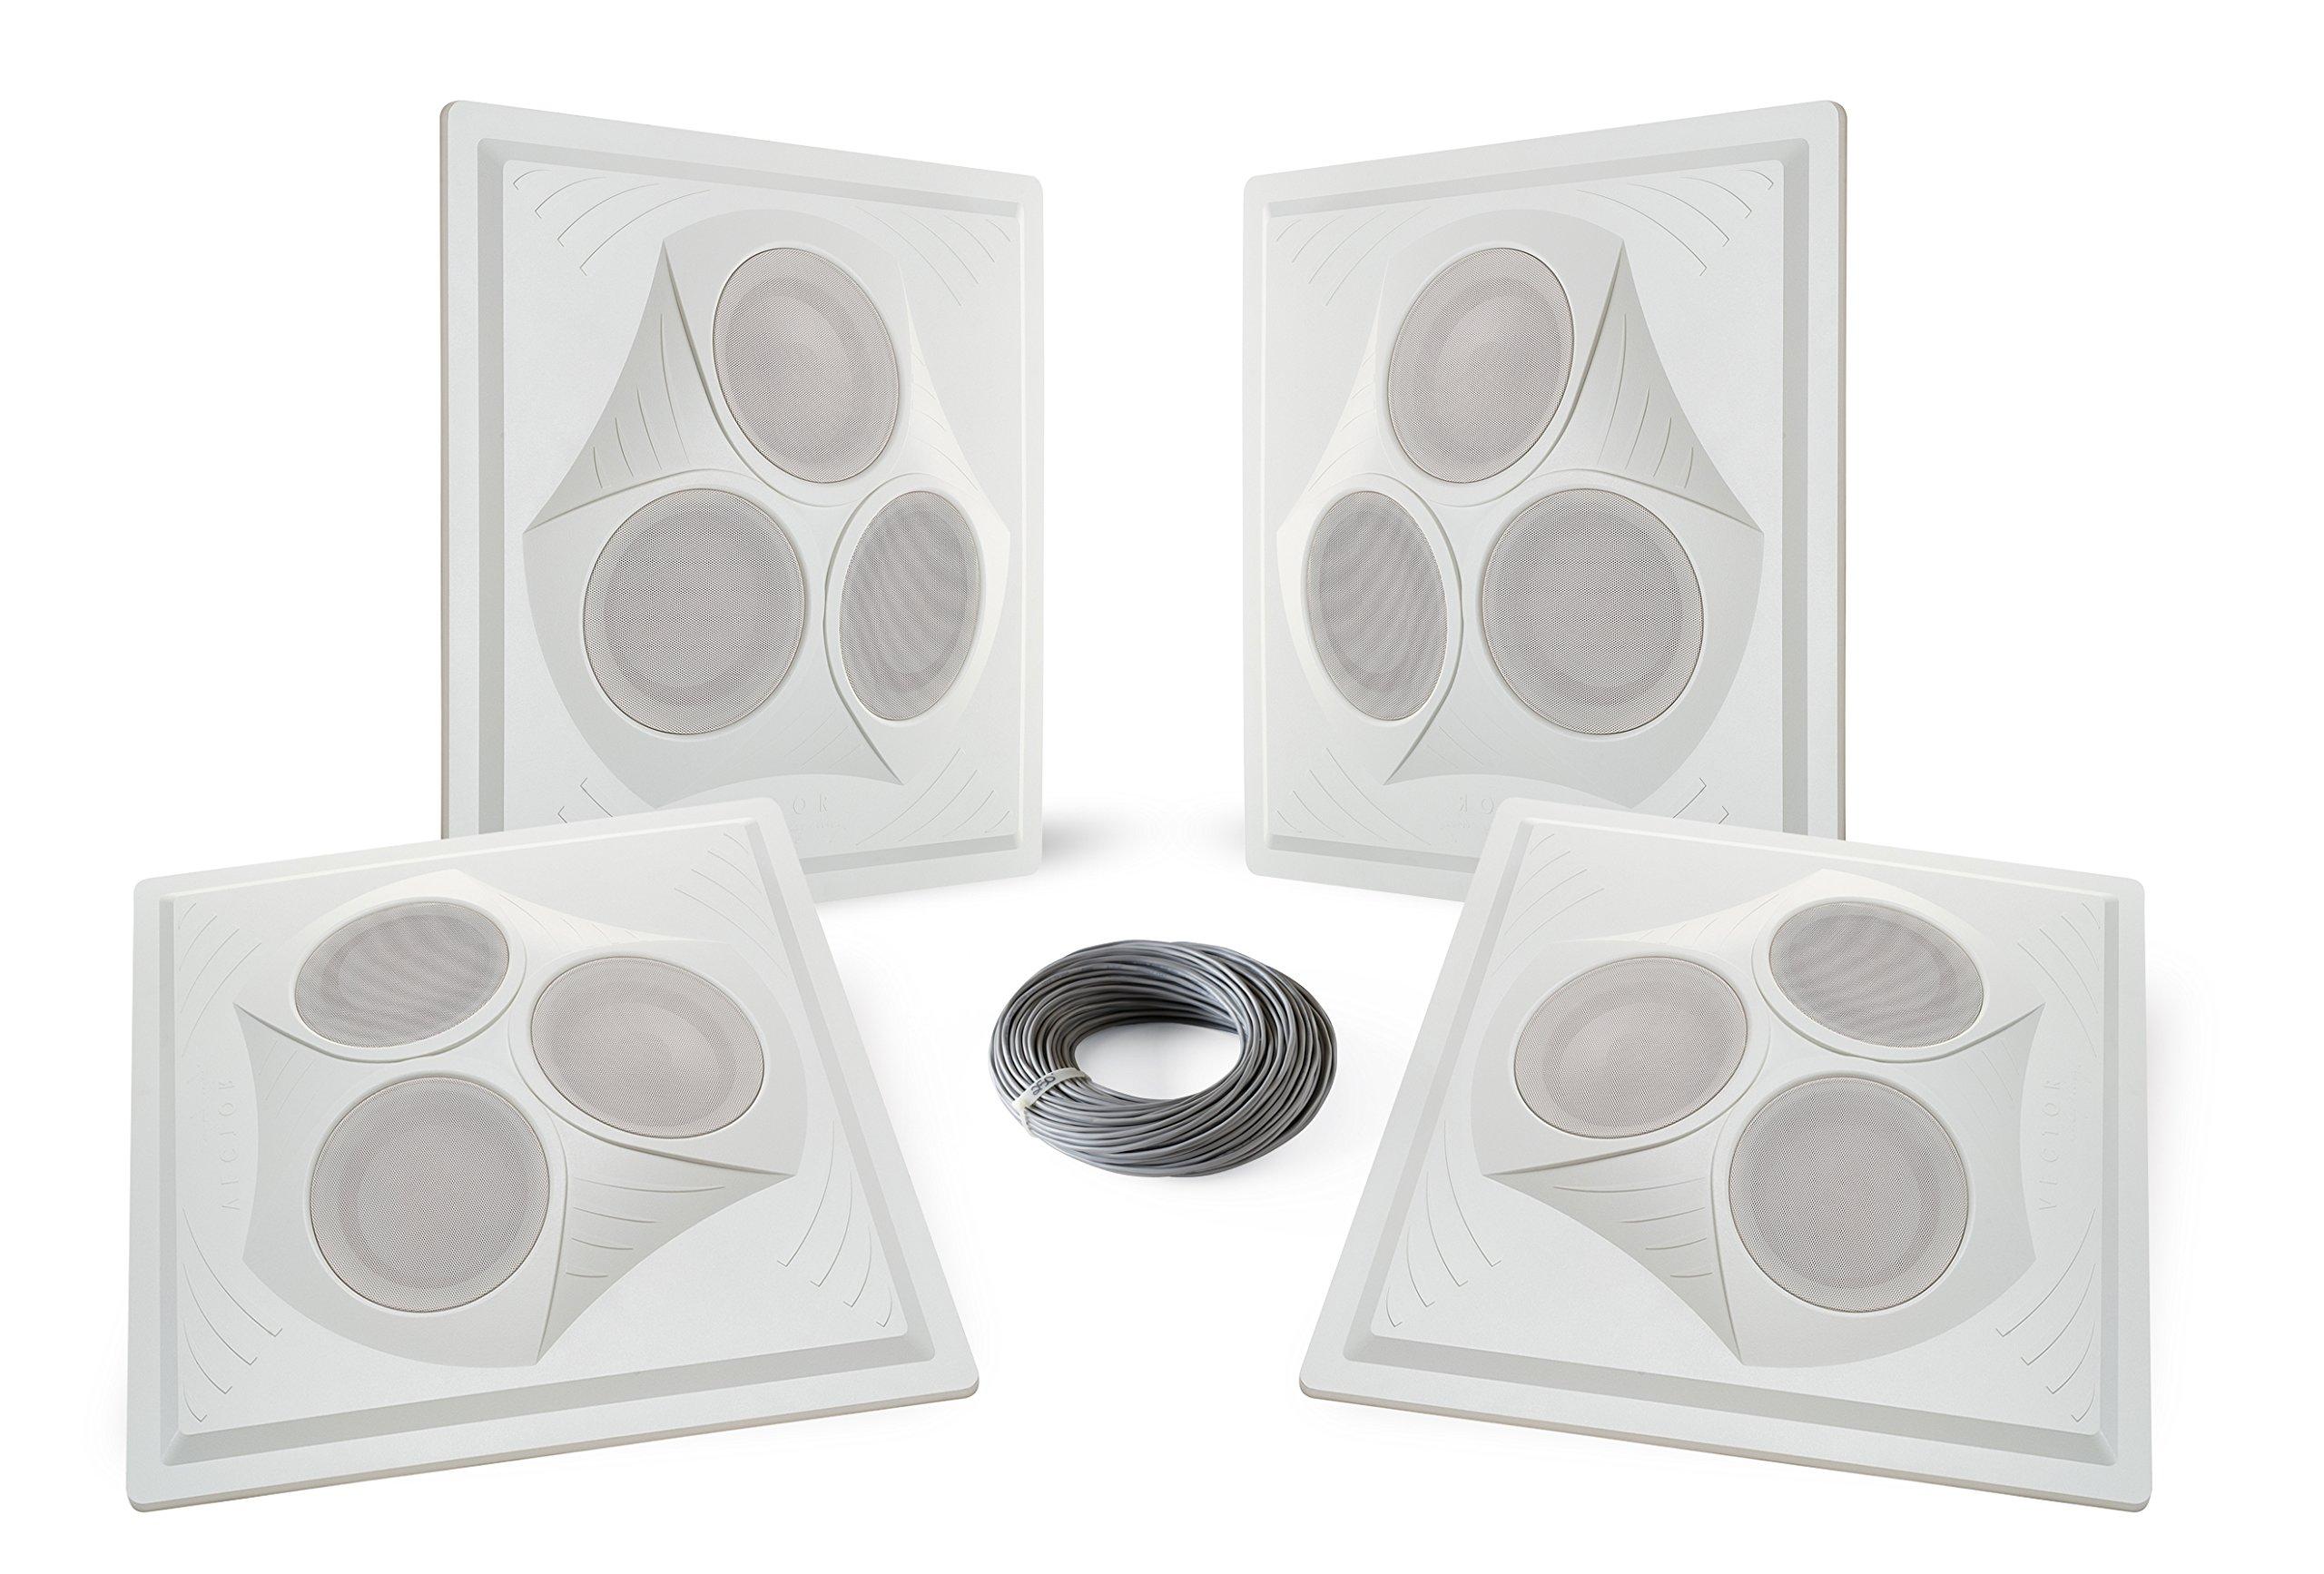 Pure Resonance Audio VCA8 - Vector Ceiling Speaker Array 120 Watts 8 Ohm (4 Speakers + Wire)